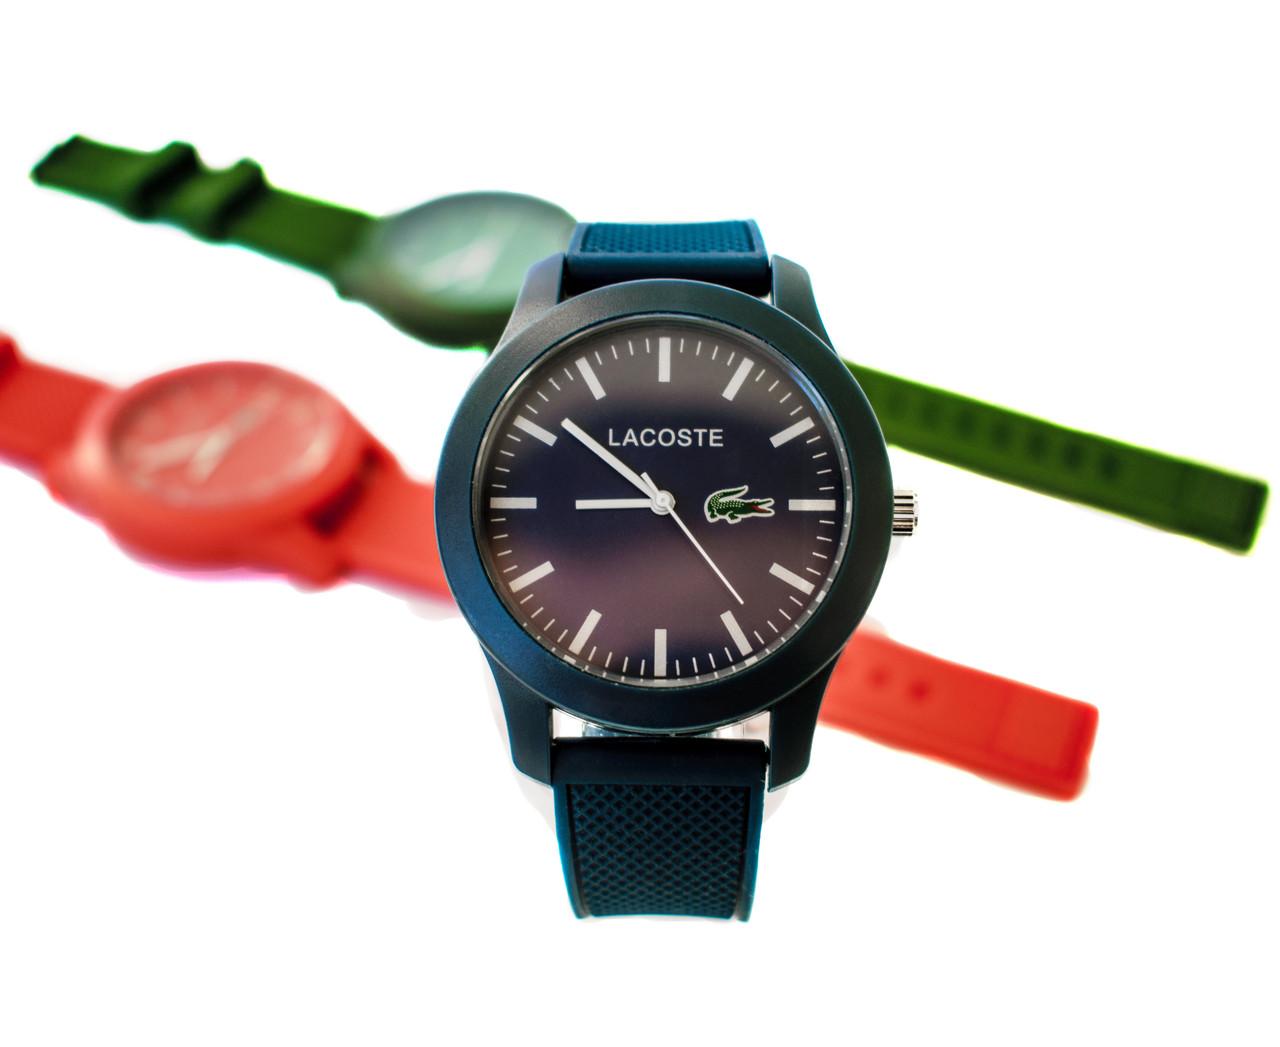 Женские часы Lacoste три цвета (replica)